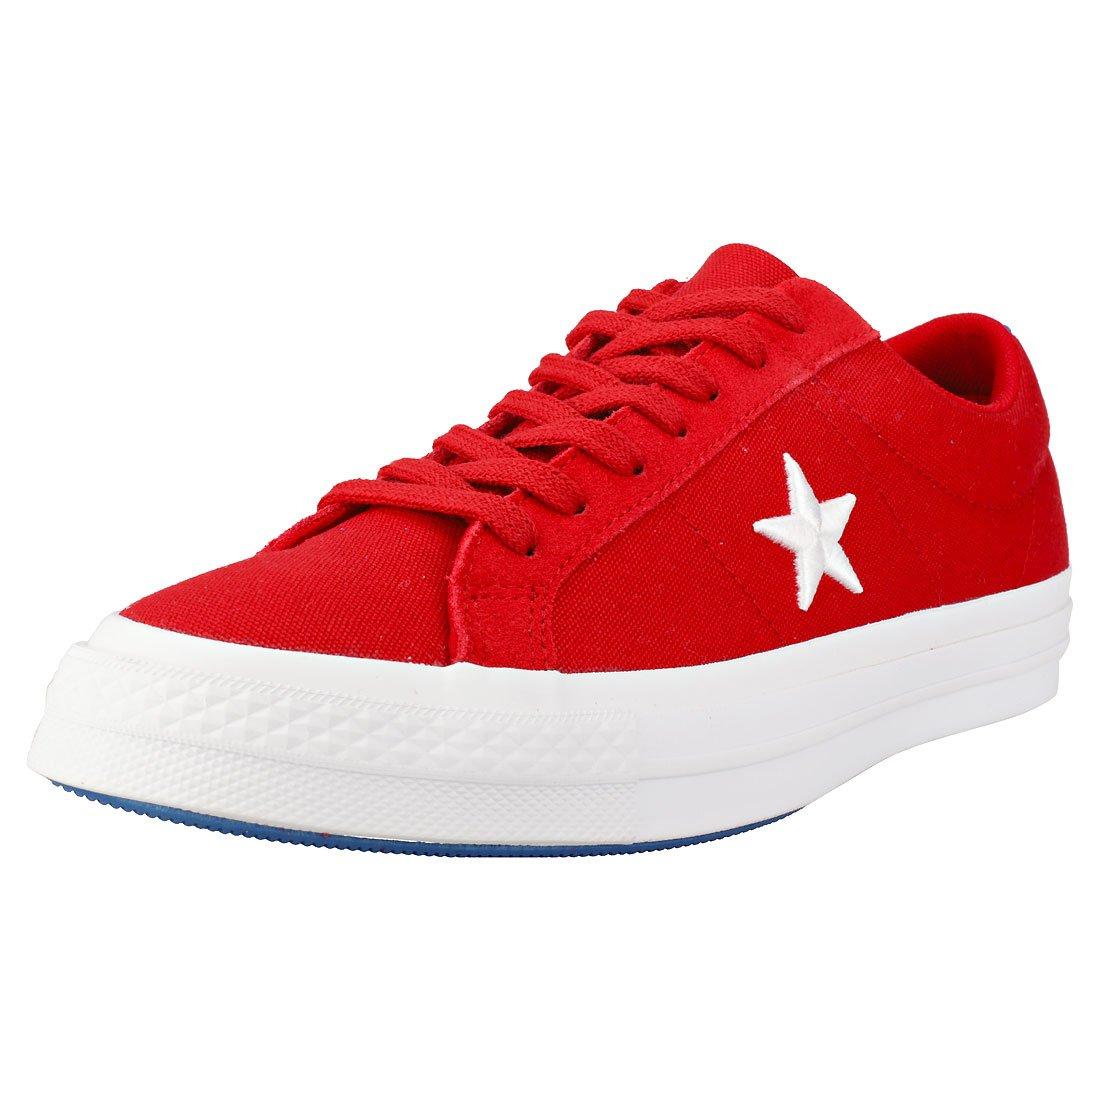 Converse ユニセックスアダルト B07CJXCC7V 12 D(M) US|Gym Red/White/Hyper Royal Gym Red/White/Hyper Royal 12 D(M) US